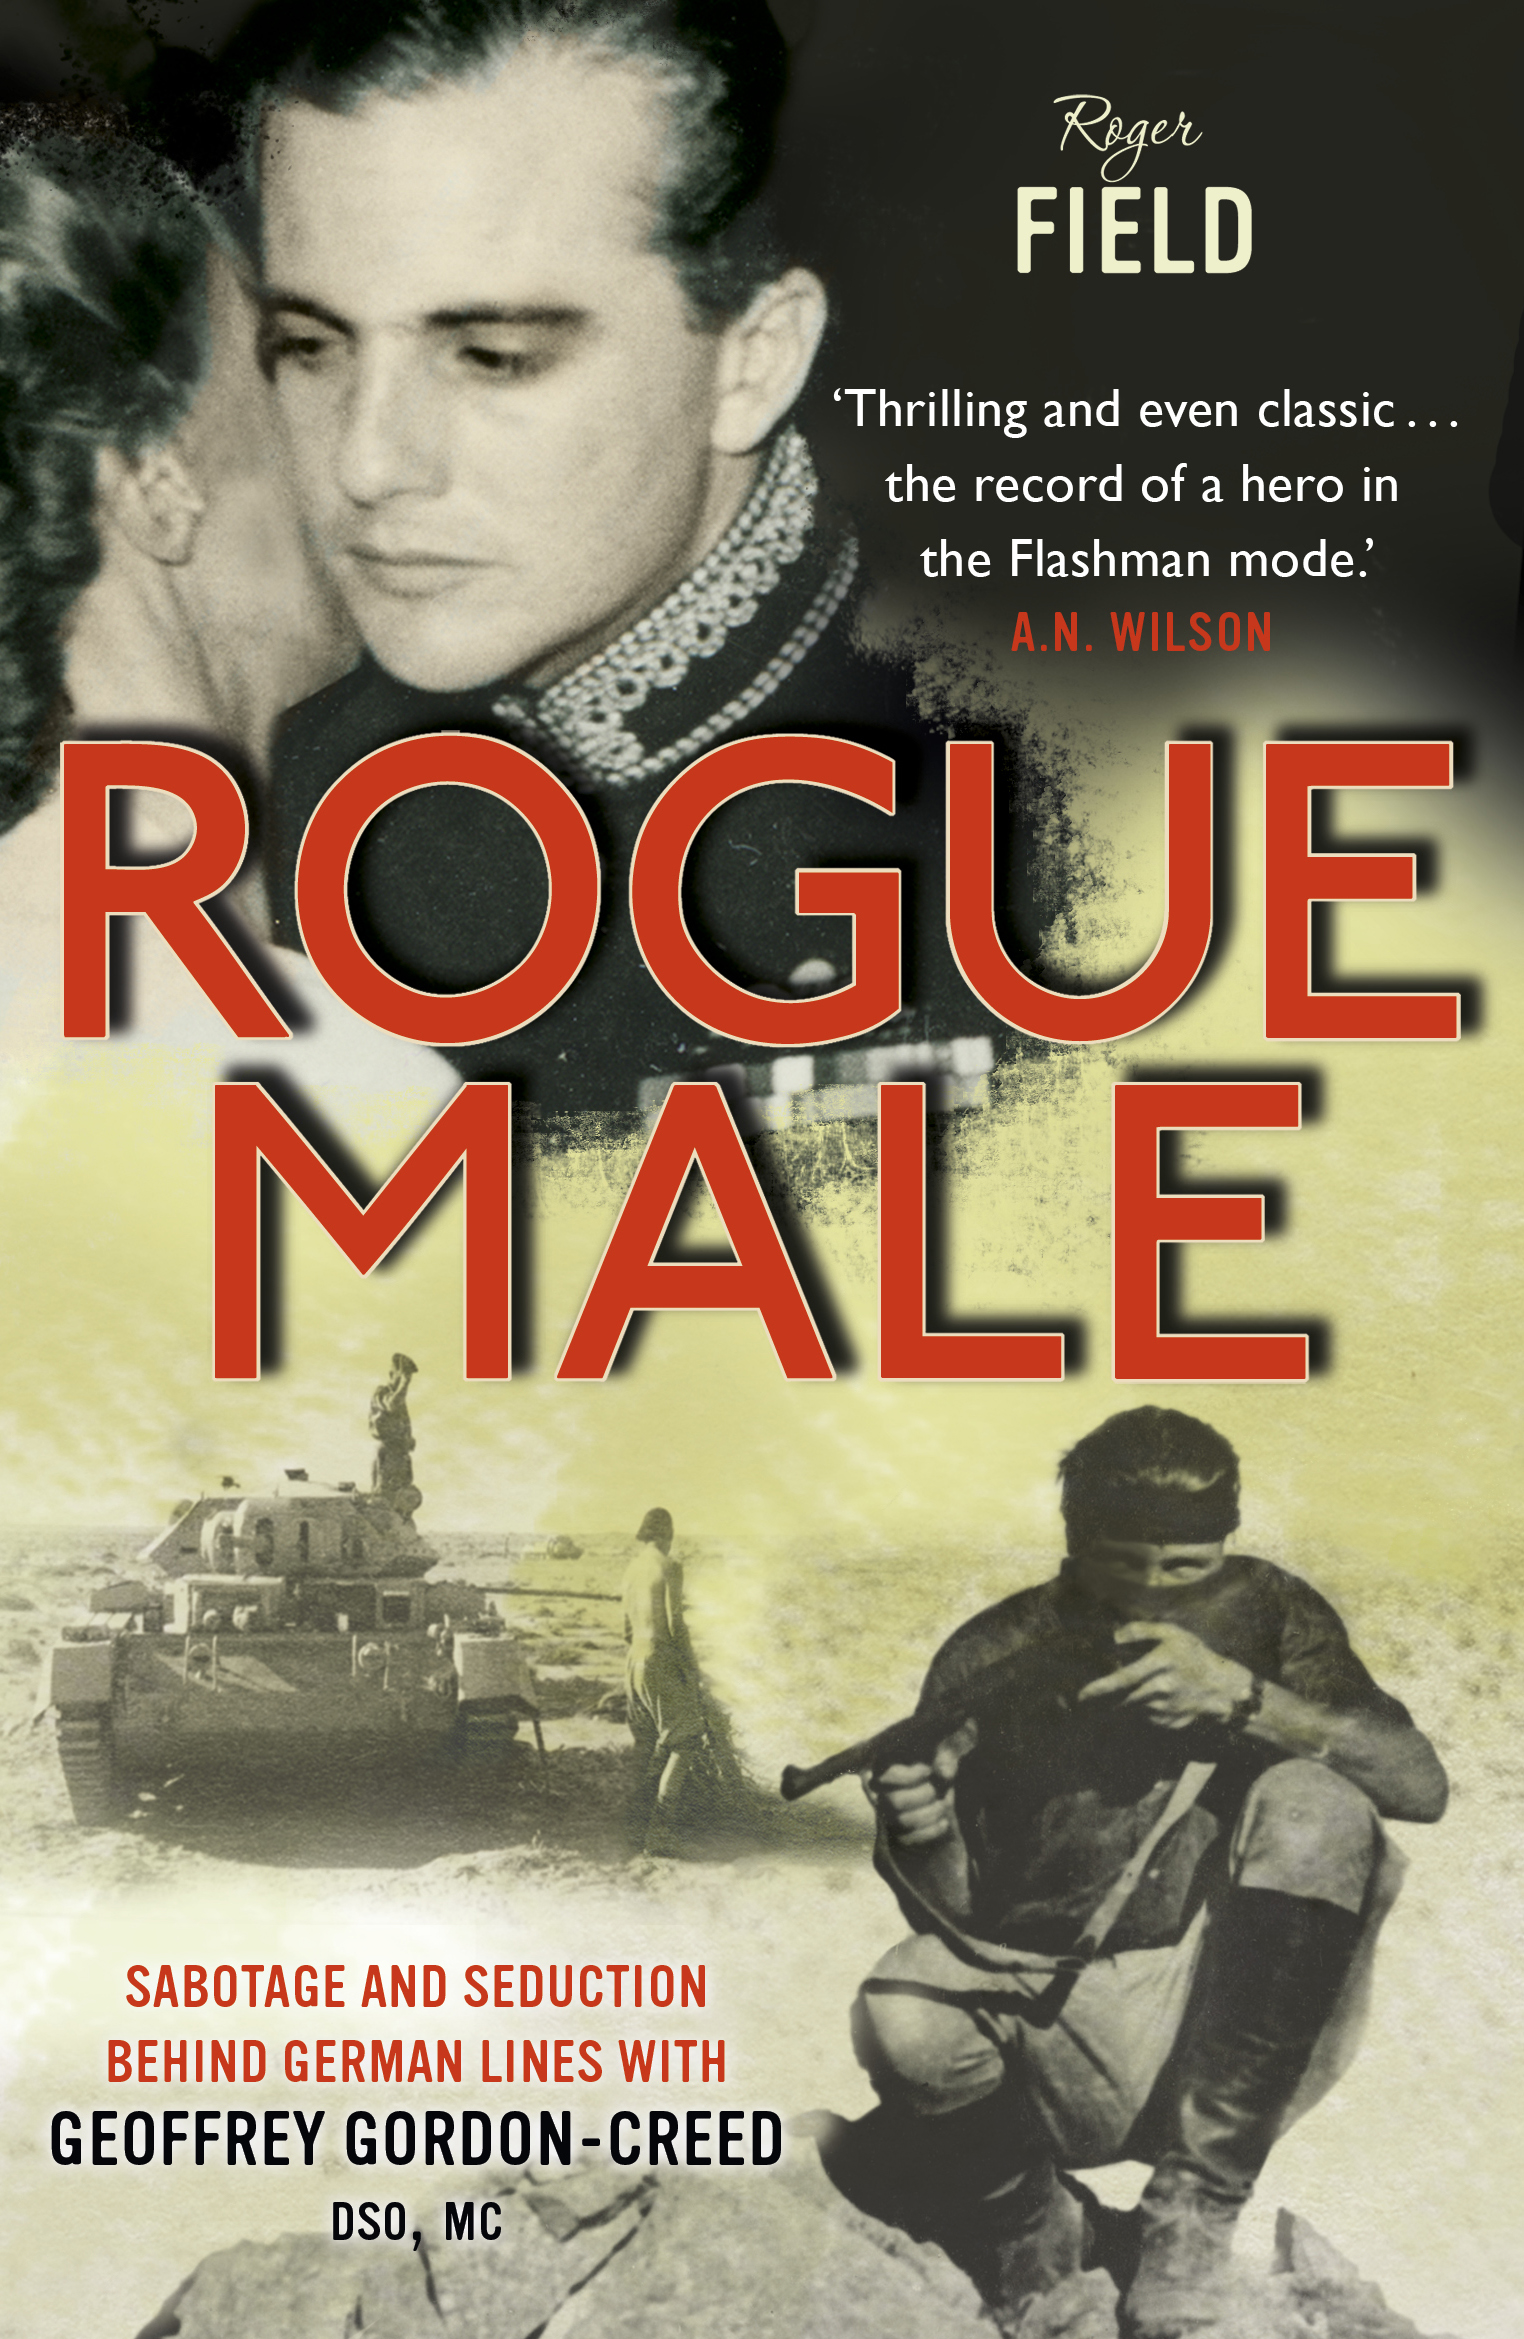 Rogue Male paperback.jpg